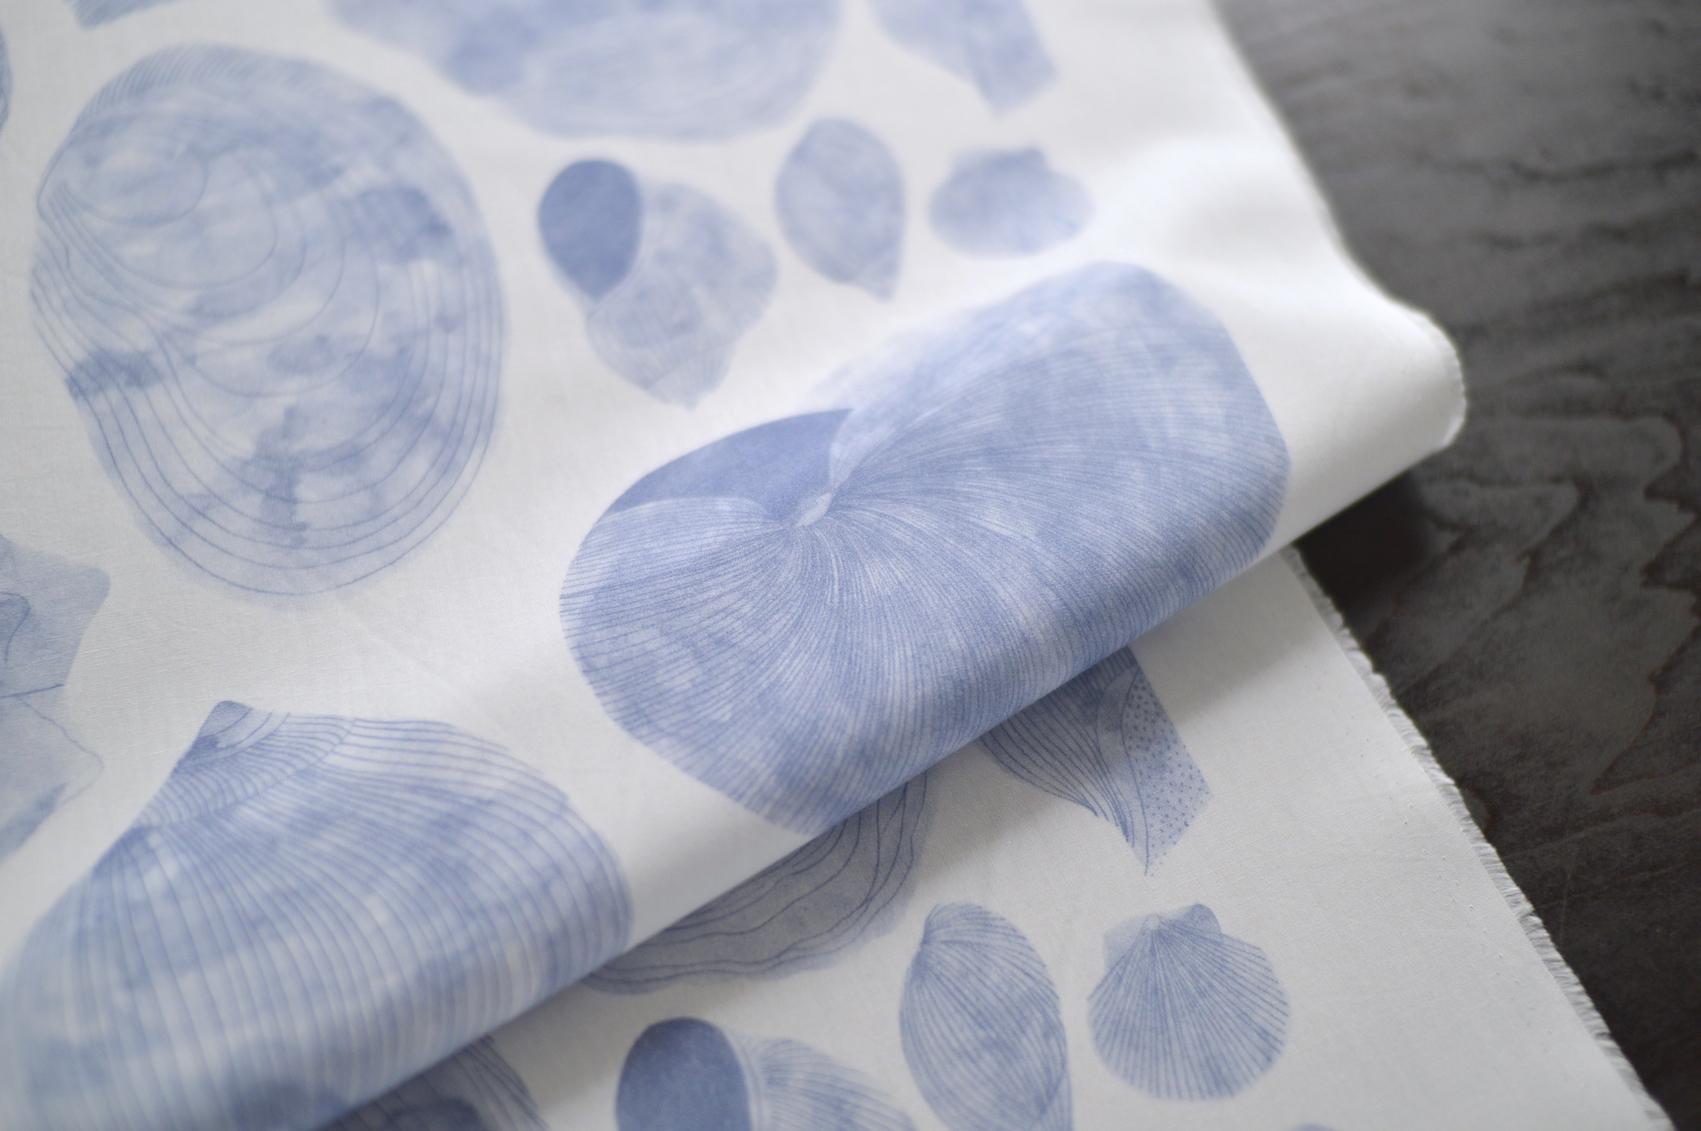 shellの生地は青色が新登場です。 切り売り生地 ¥2100-/50cm〜 カットクロス ¥1100-